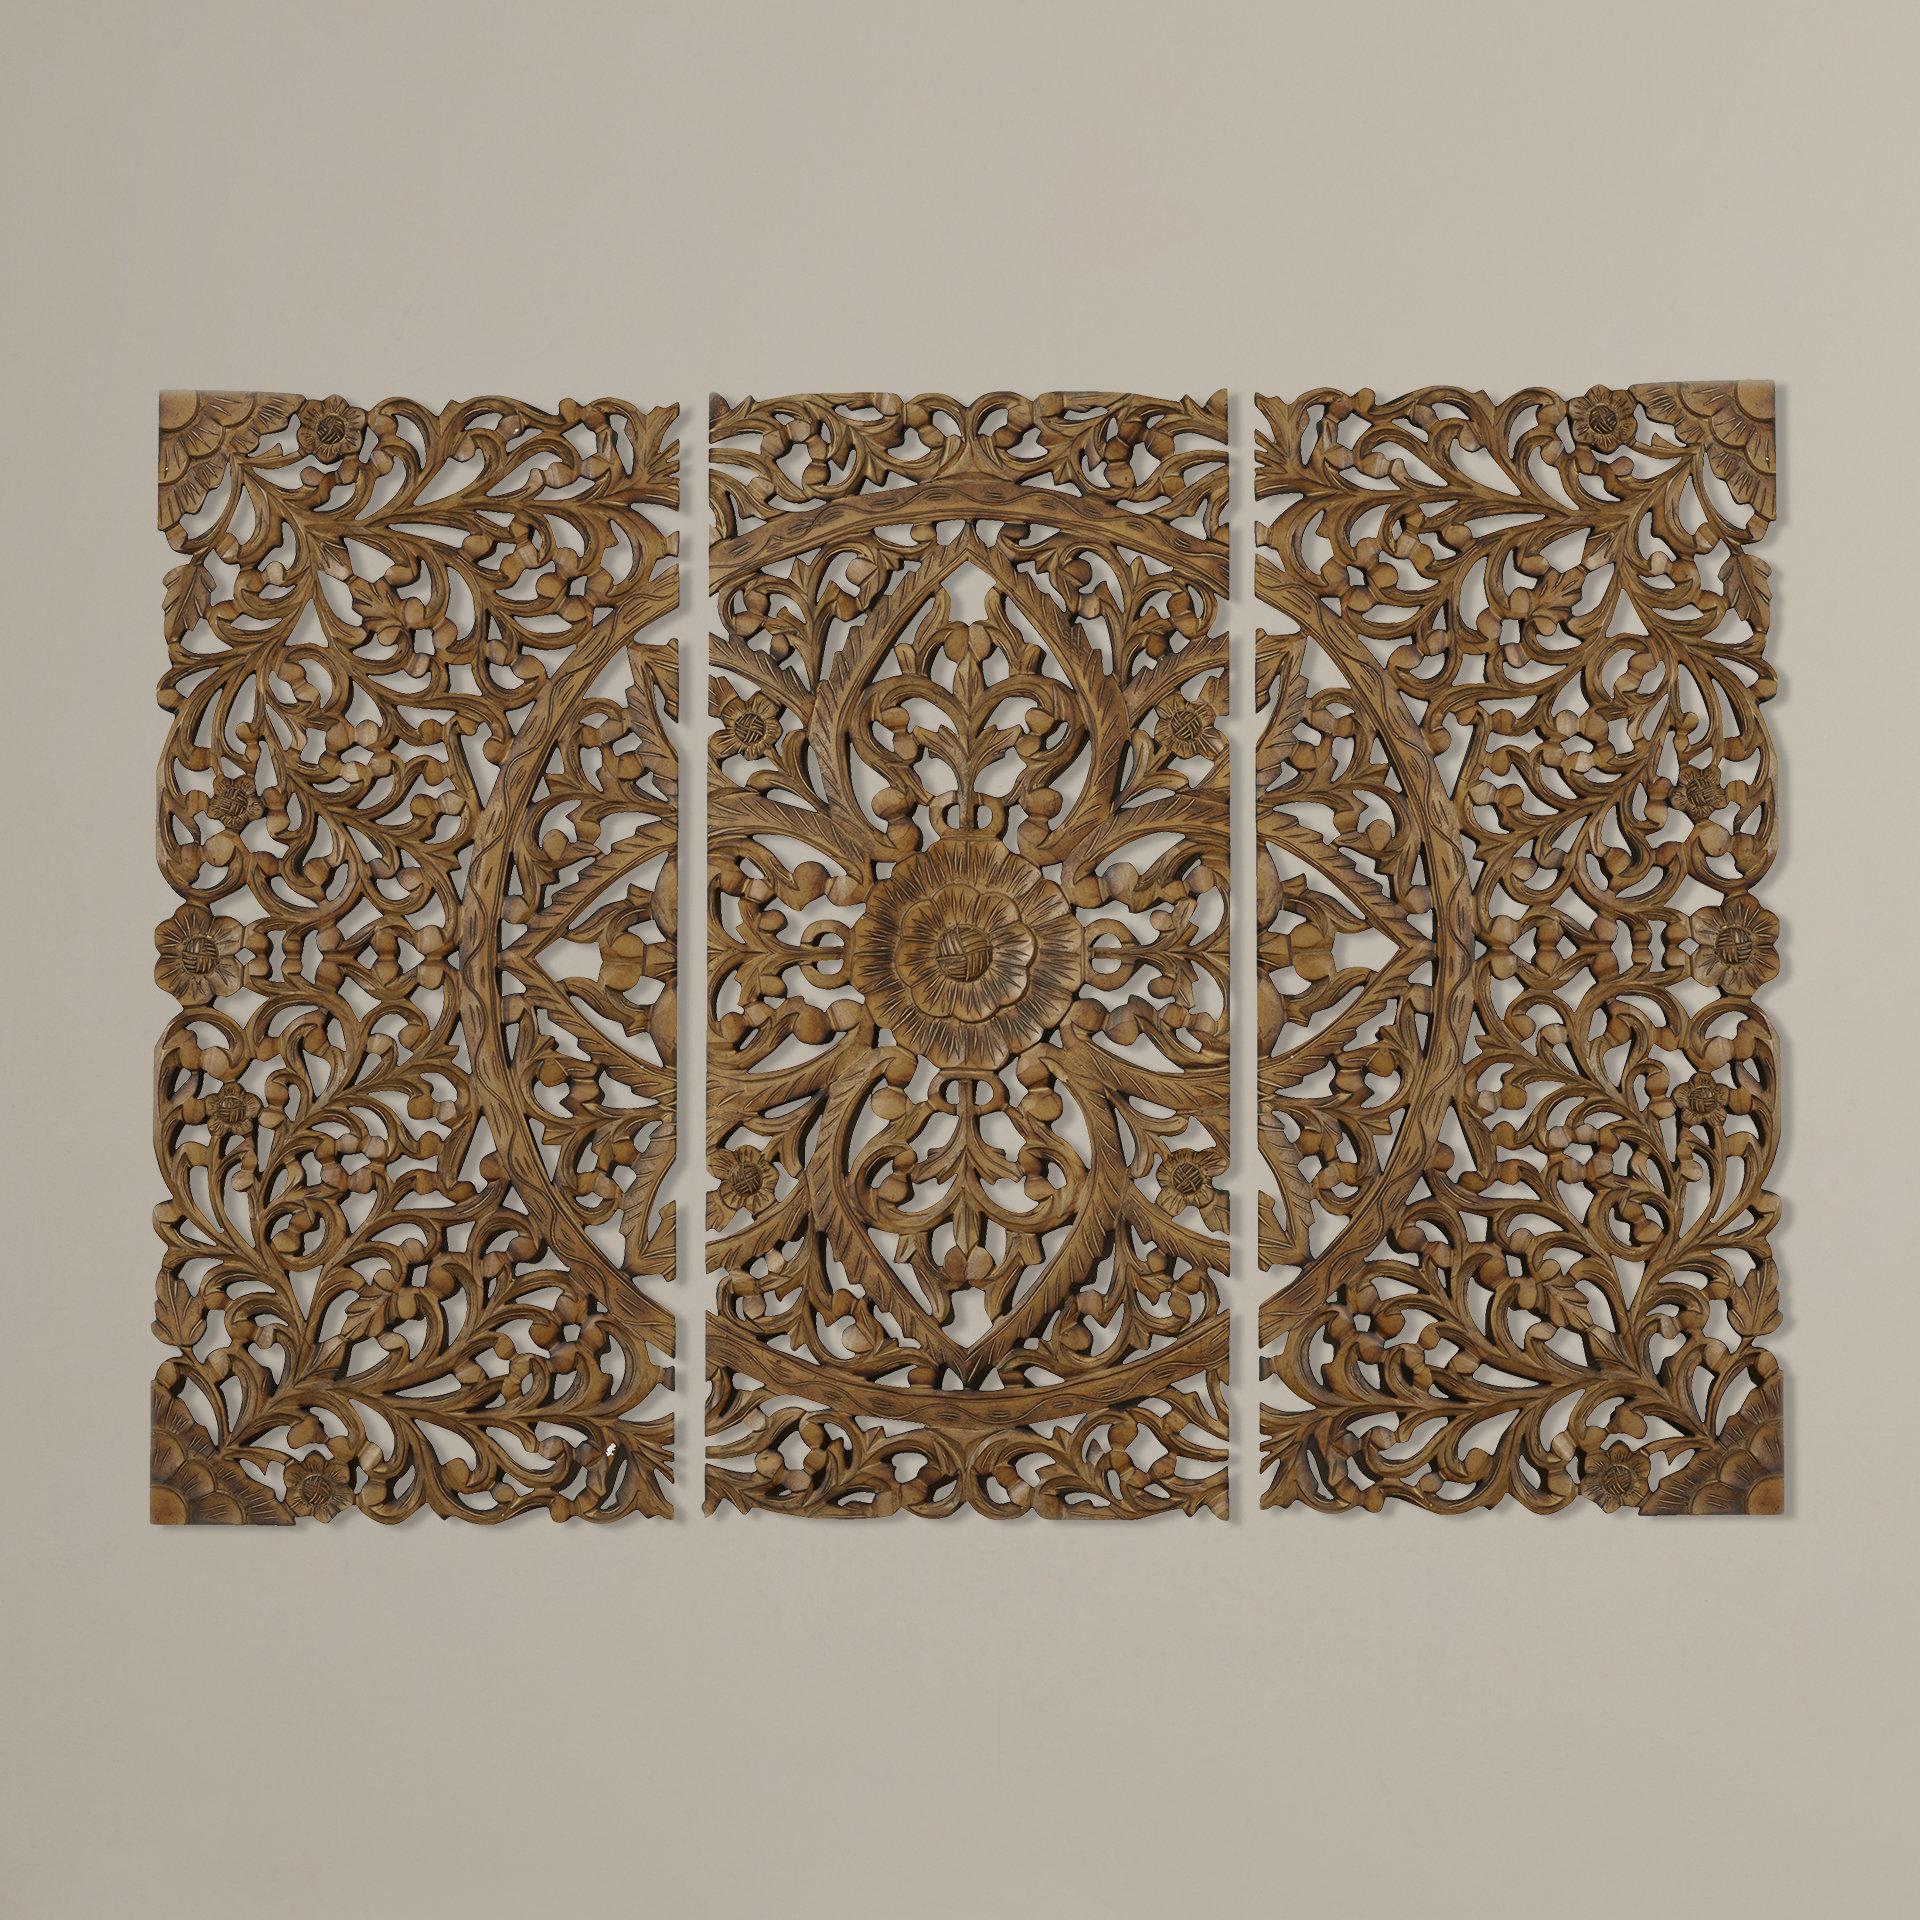 Wood Wall Art You'll Love In 2019 | Wayfair Regarding Panel Wood Wall Decor Sets (set Of 2) (View 9 of 30)